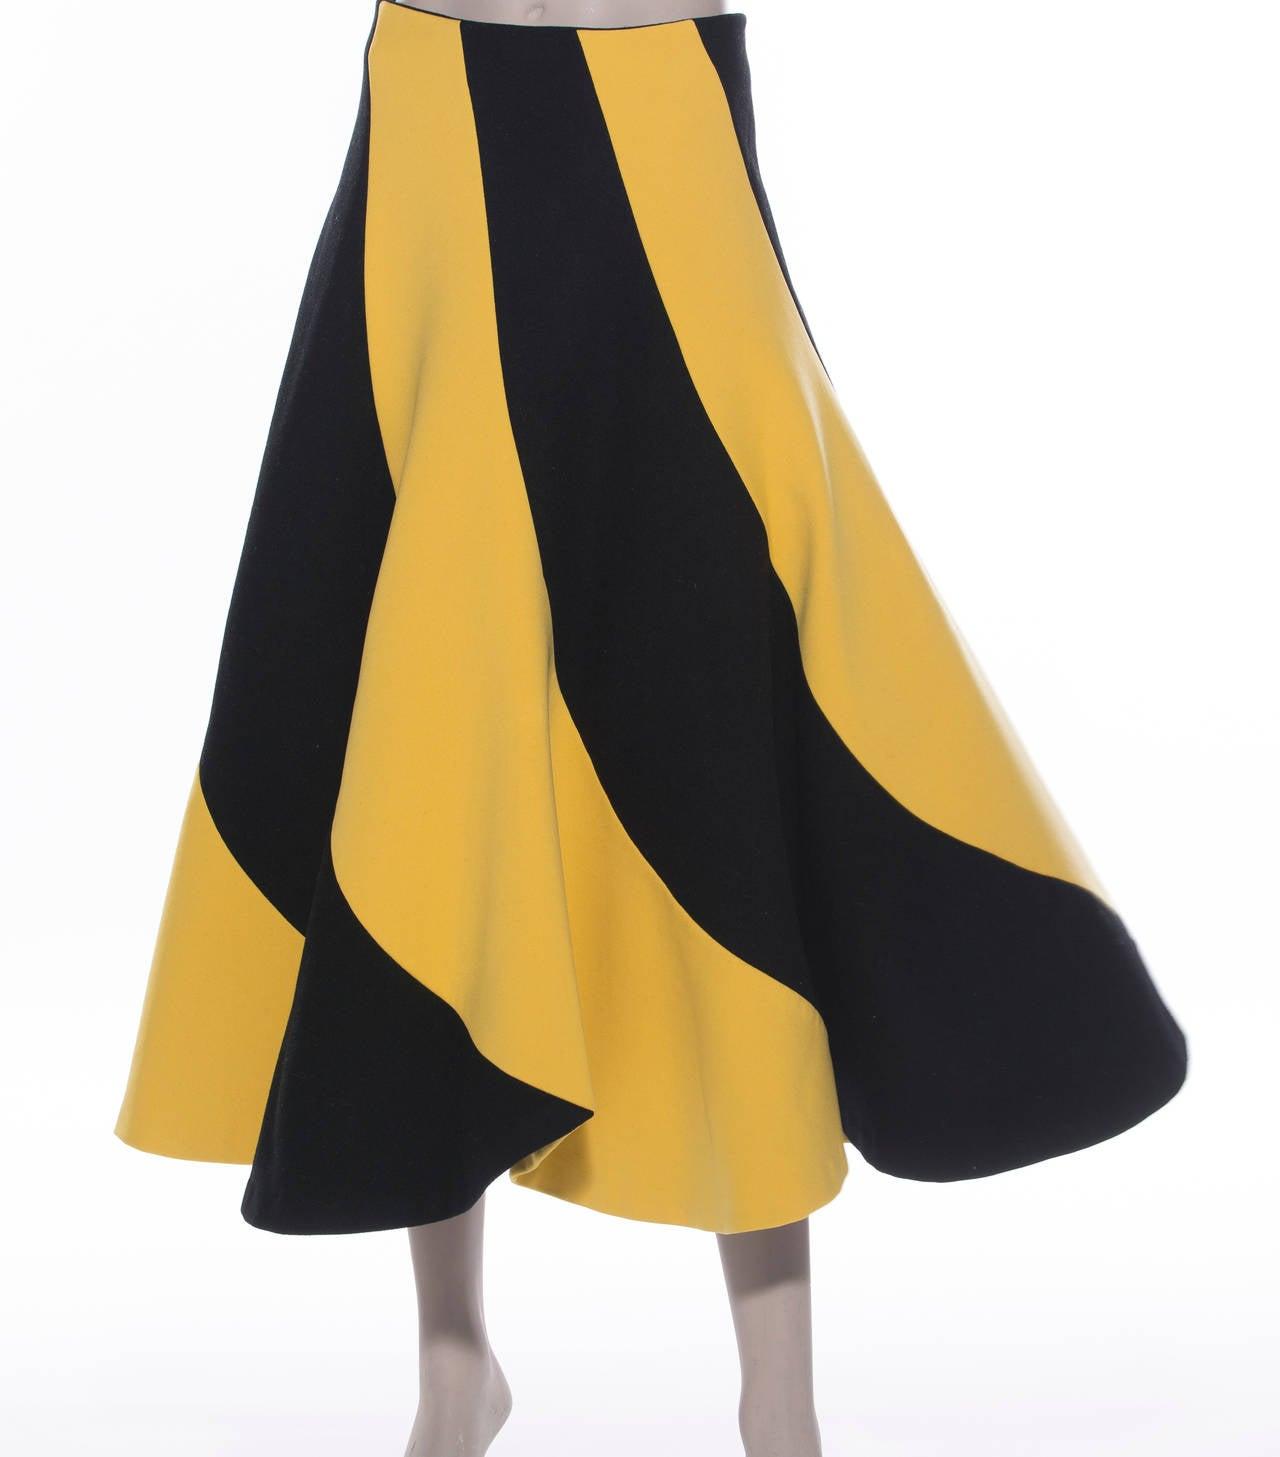 Yohji Yamamoto Circle Skirt, Circa 1990's 7